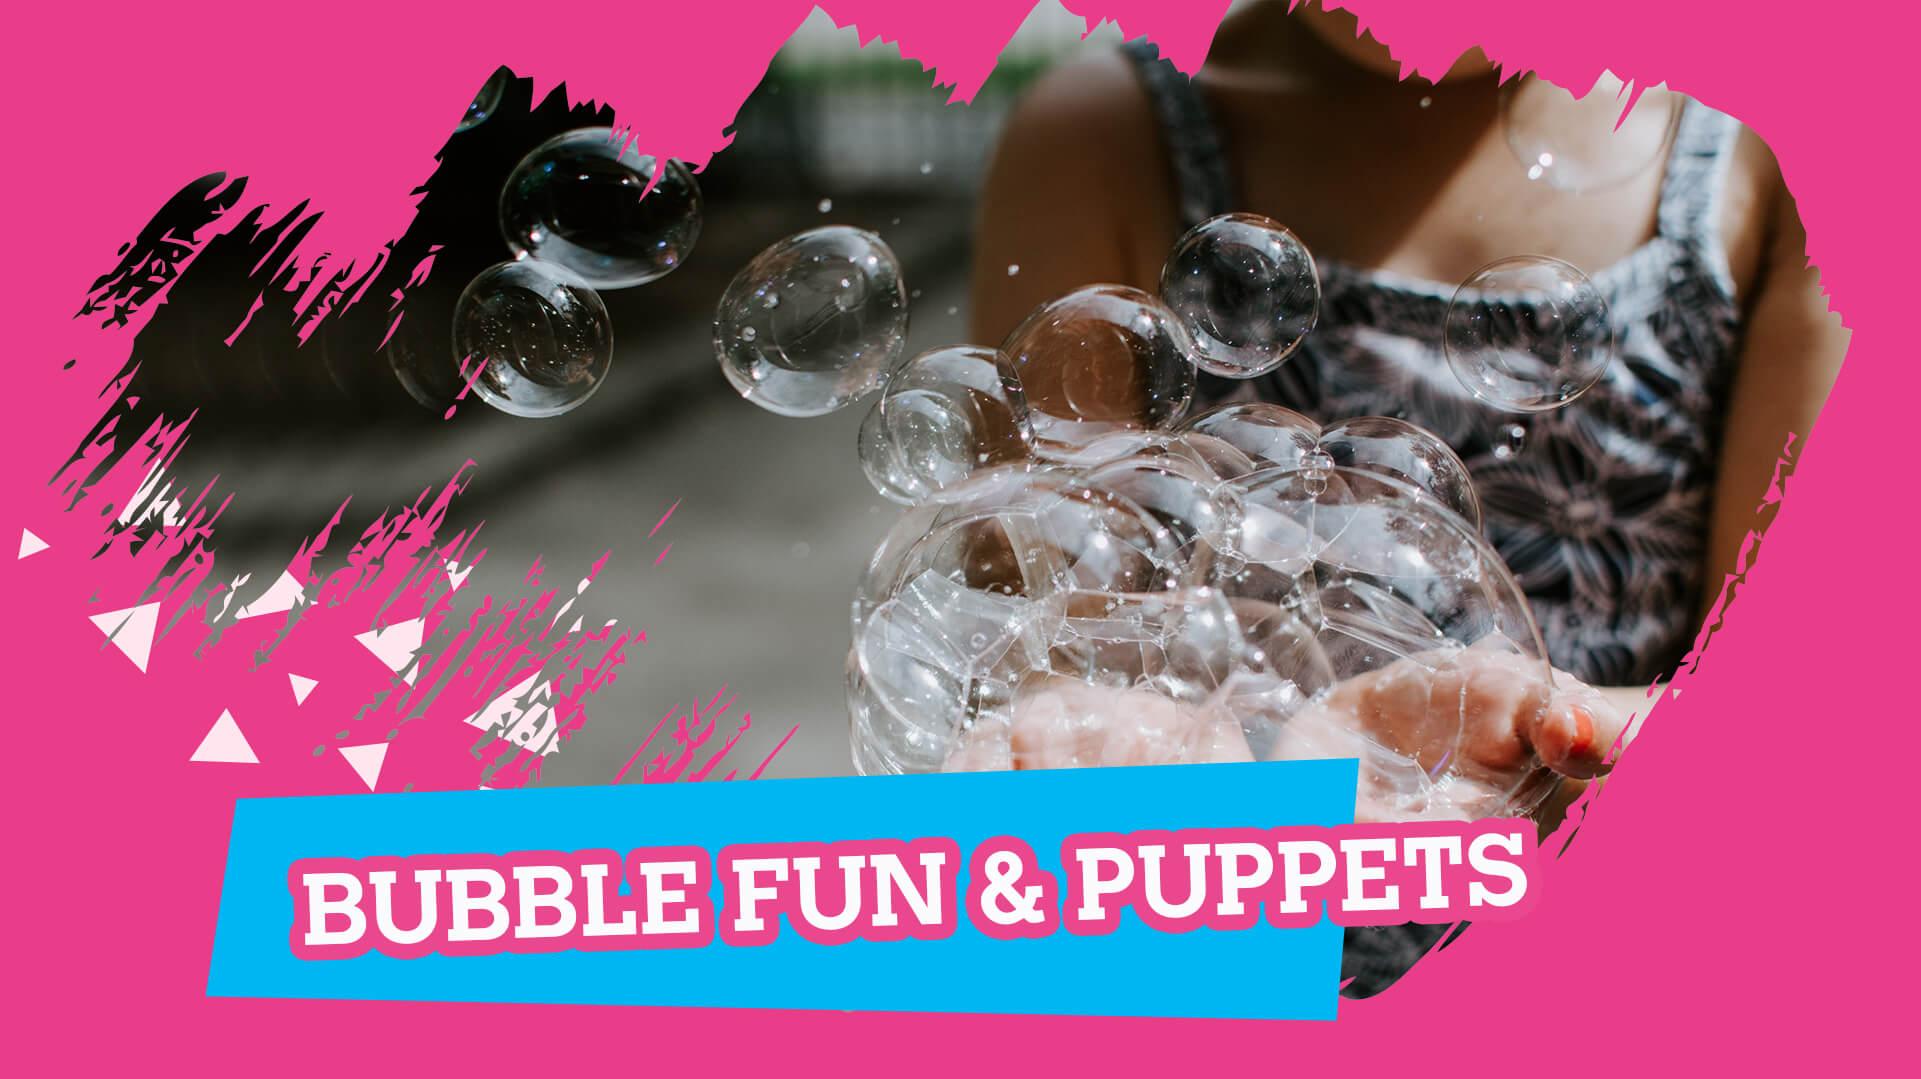 Bubble Fun & Puppets